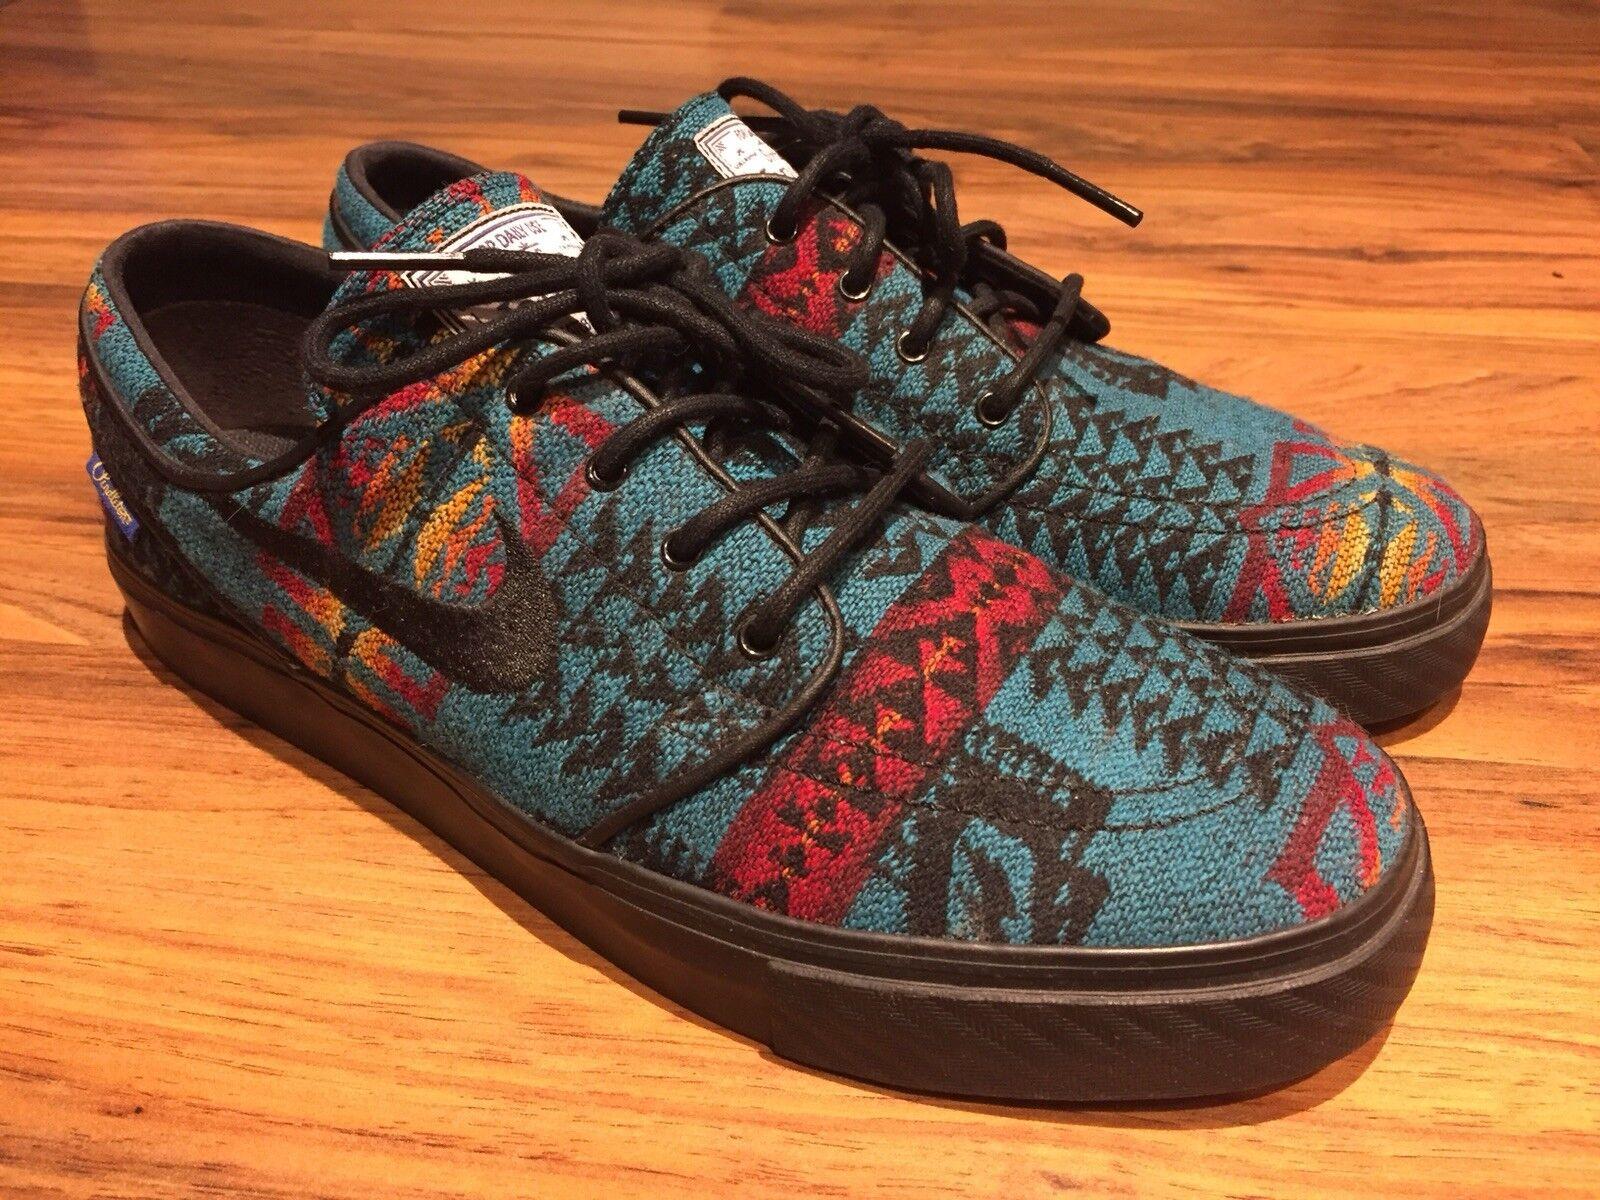 Nike SB Janoski shoes PENDLETON Woolen Mills Fabric Mens Size 8